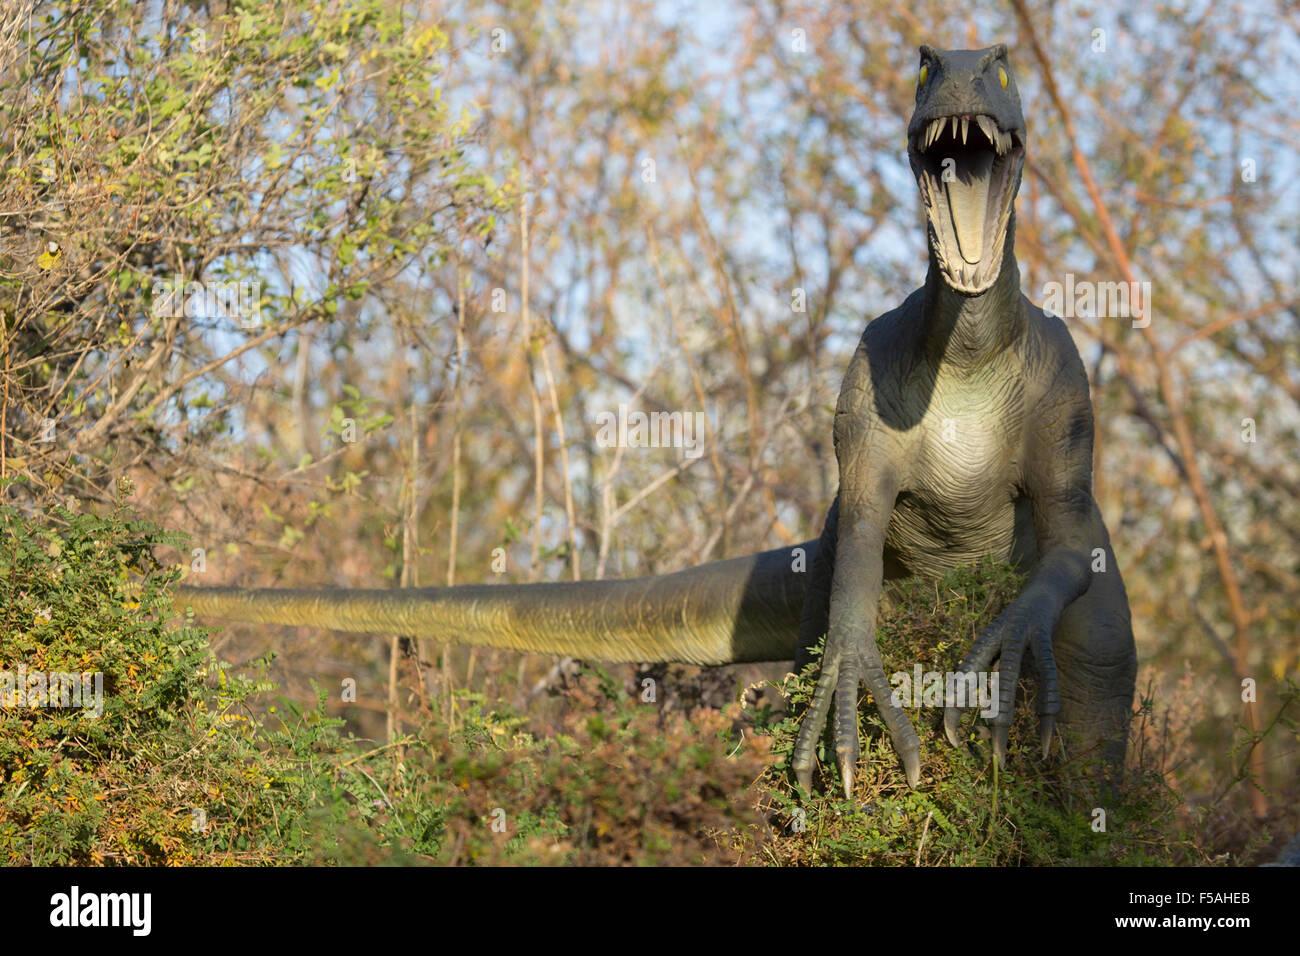 Animated velociraptor model at the Calgary Zoo prehistoric park - Stock Image